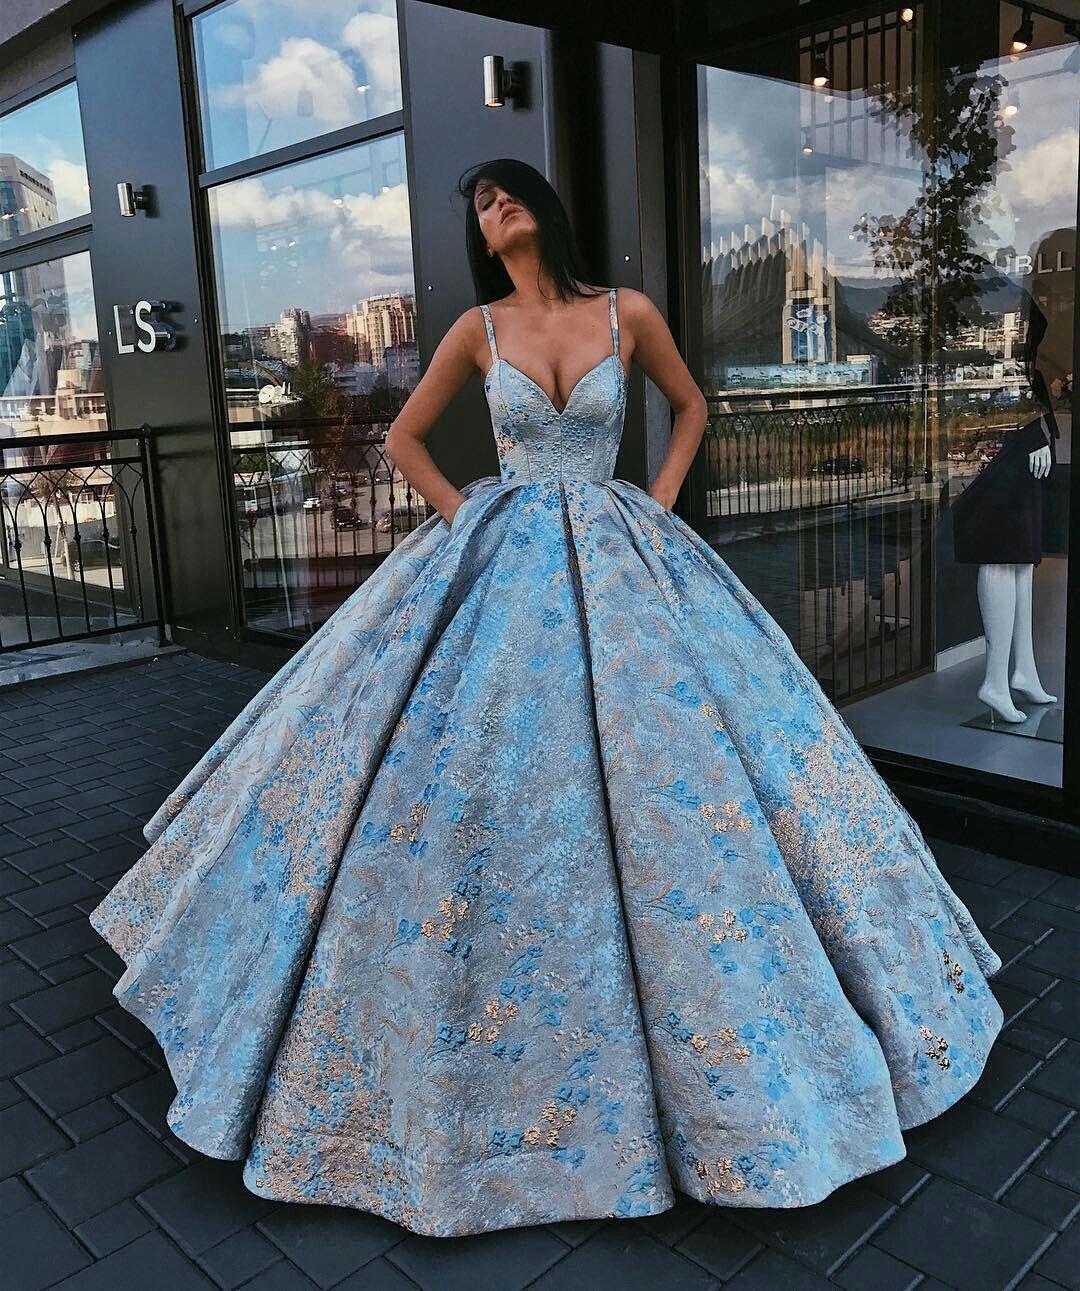 A R Y A / pinterest: @riddhisinghal6 | Beautiful Dresses | Pinterest ...